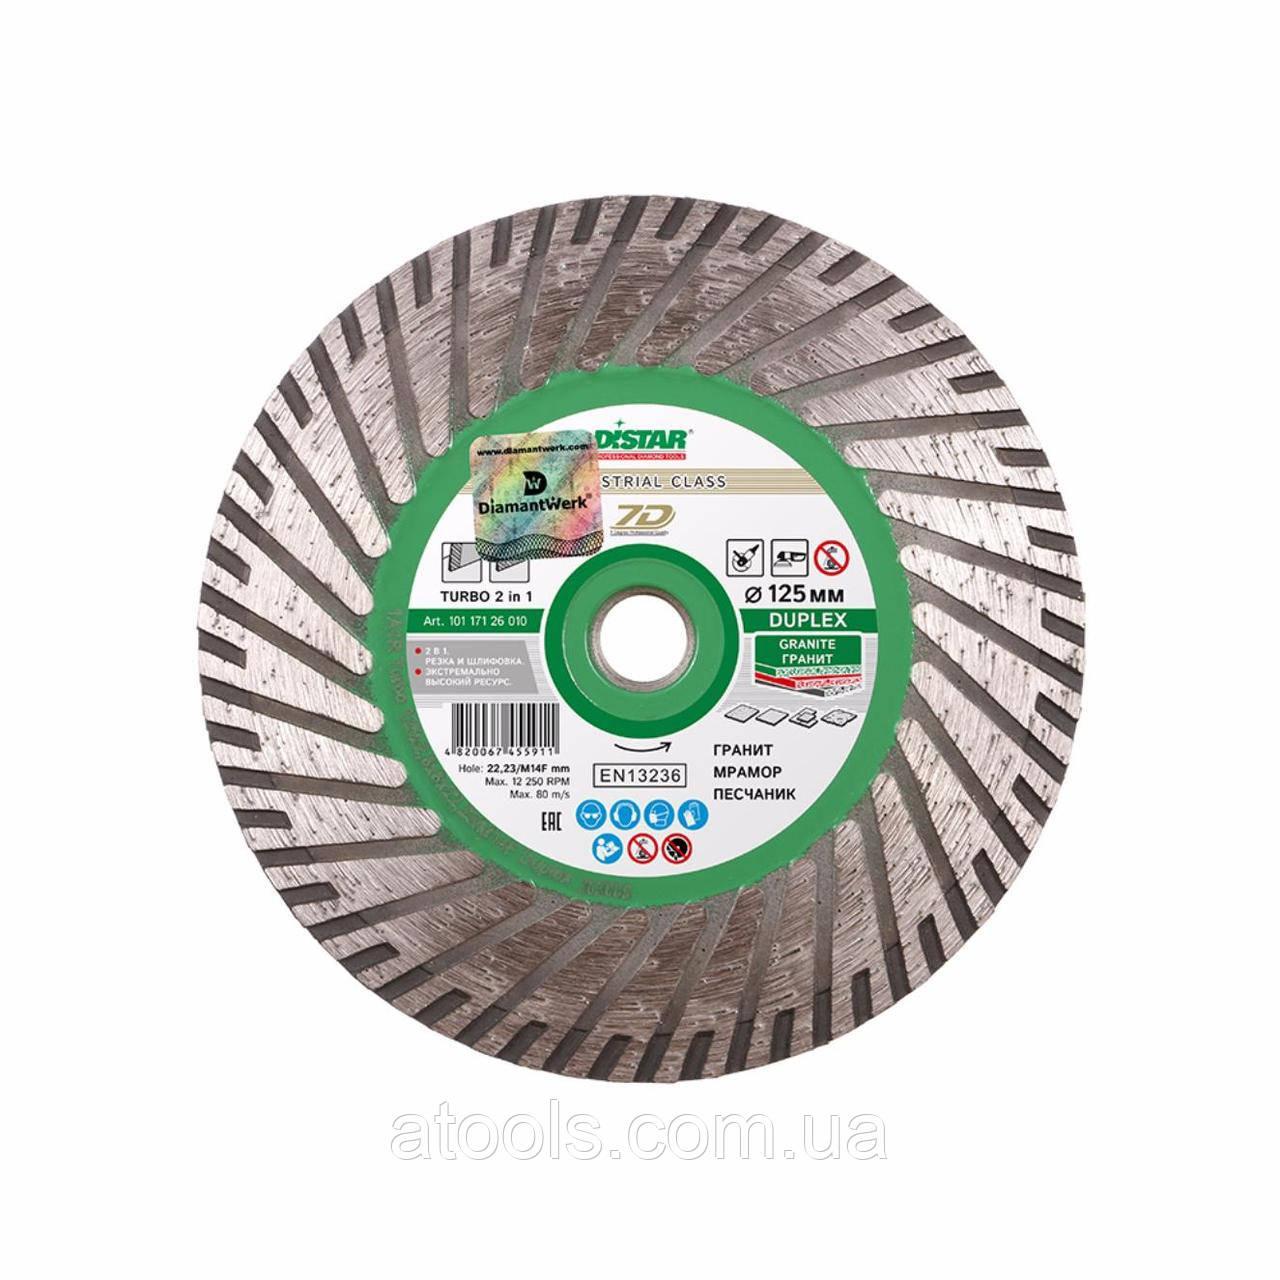 Алмазный отрезной диск Distar Turbo Duplex 125x2.8x8/25x22.23/M14F (10117126010)